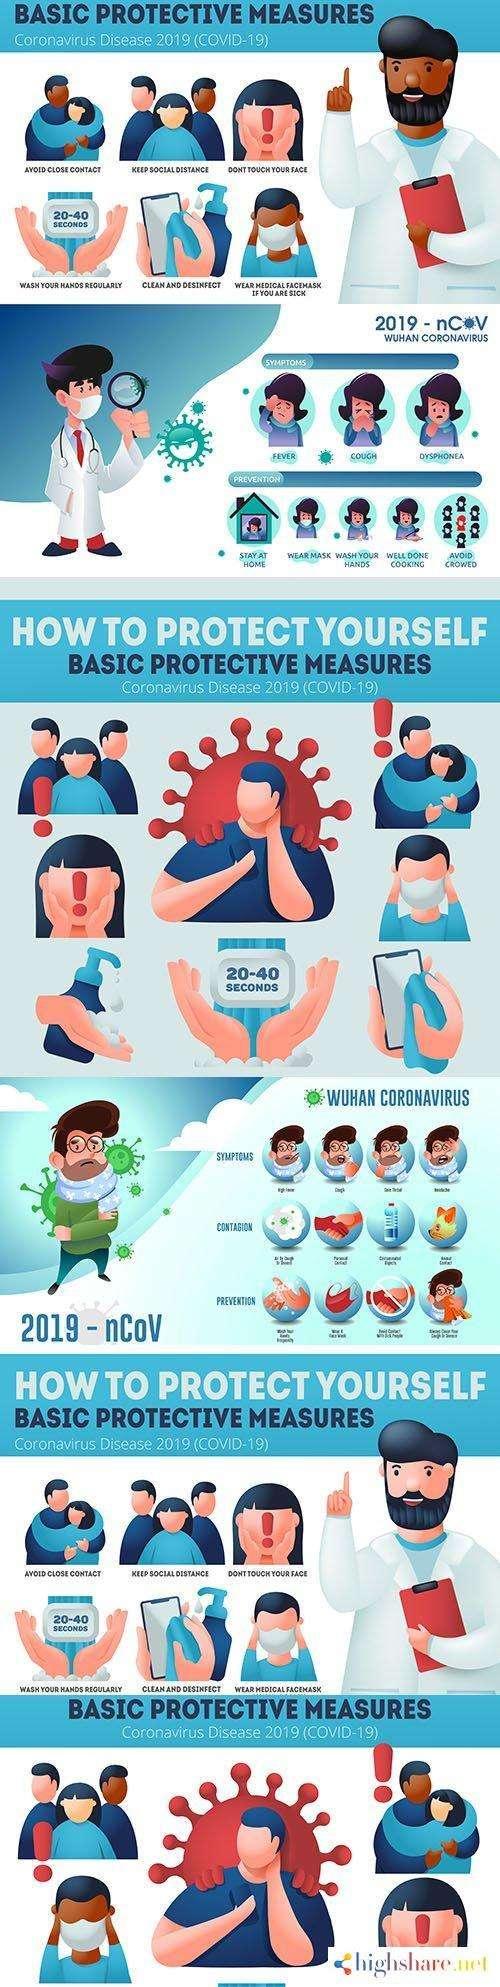 coronavirus prevention covid 19 and infographic protection measures 5f41d7b7ed20e - Coronavirus prevention covid-19 and infographic protection measures